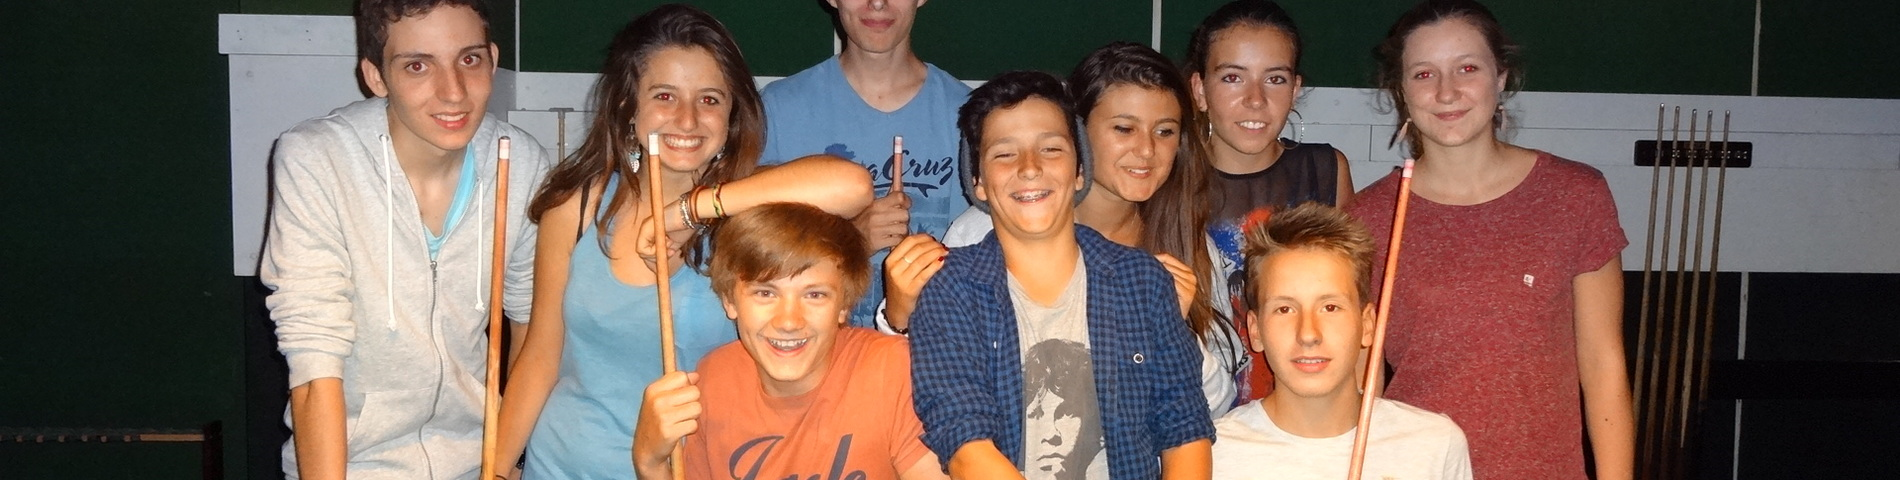 Anglophiles Summer School зображення 1